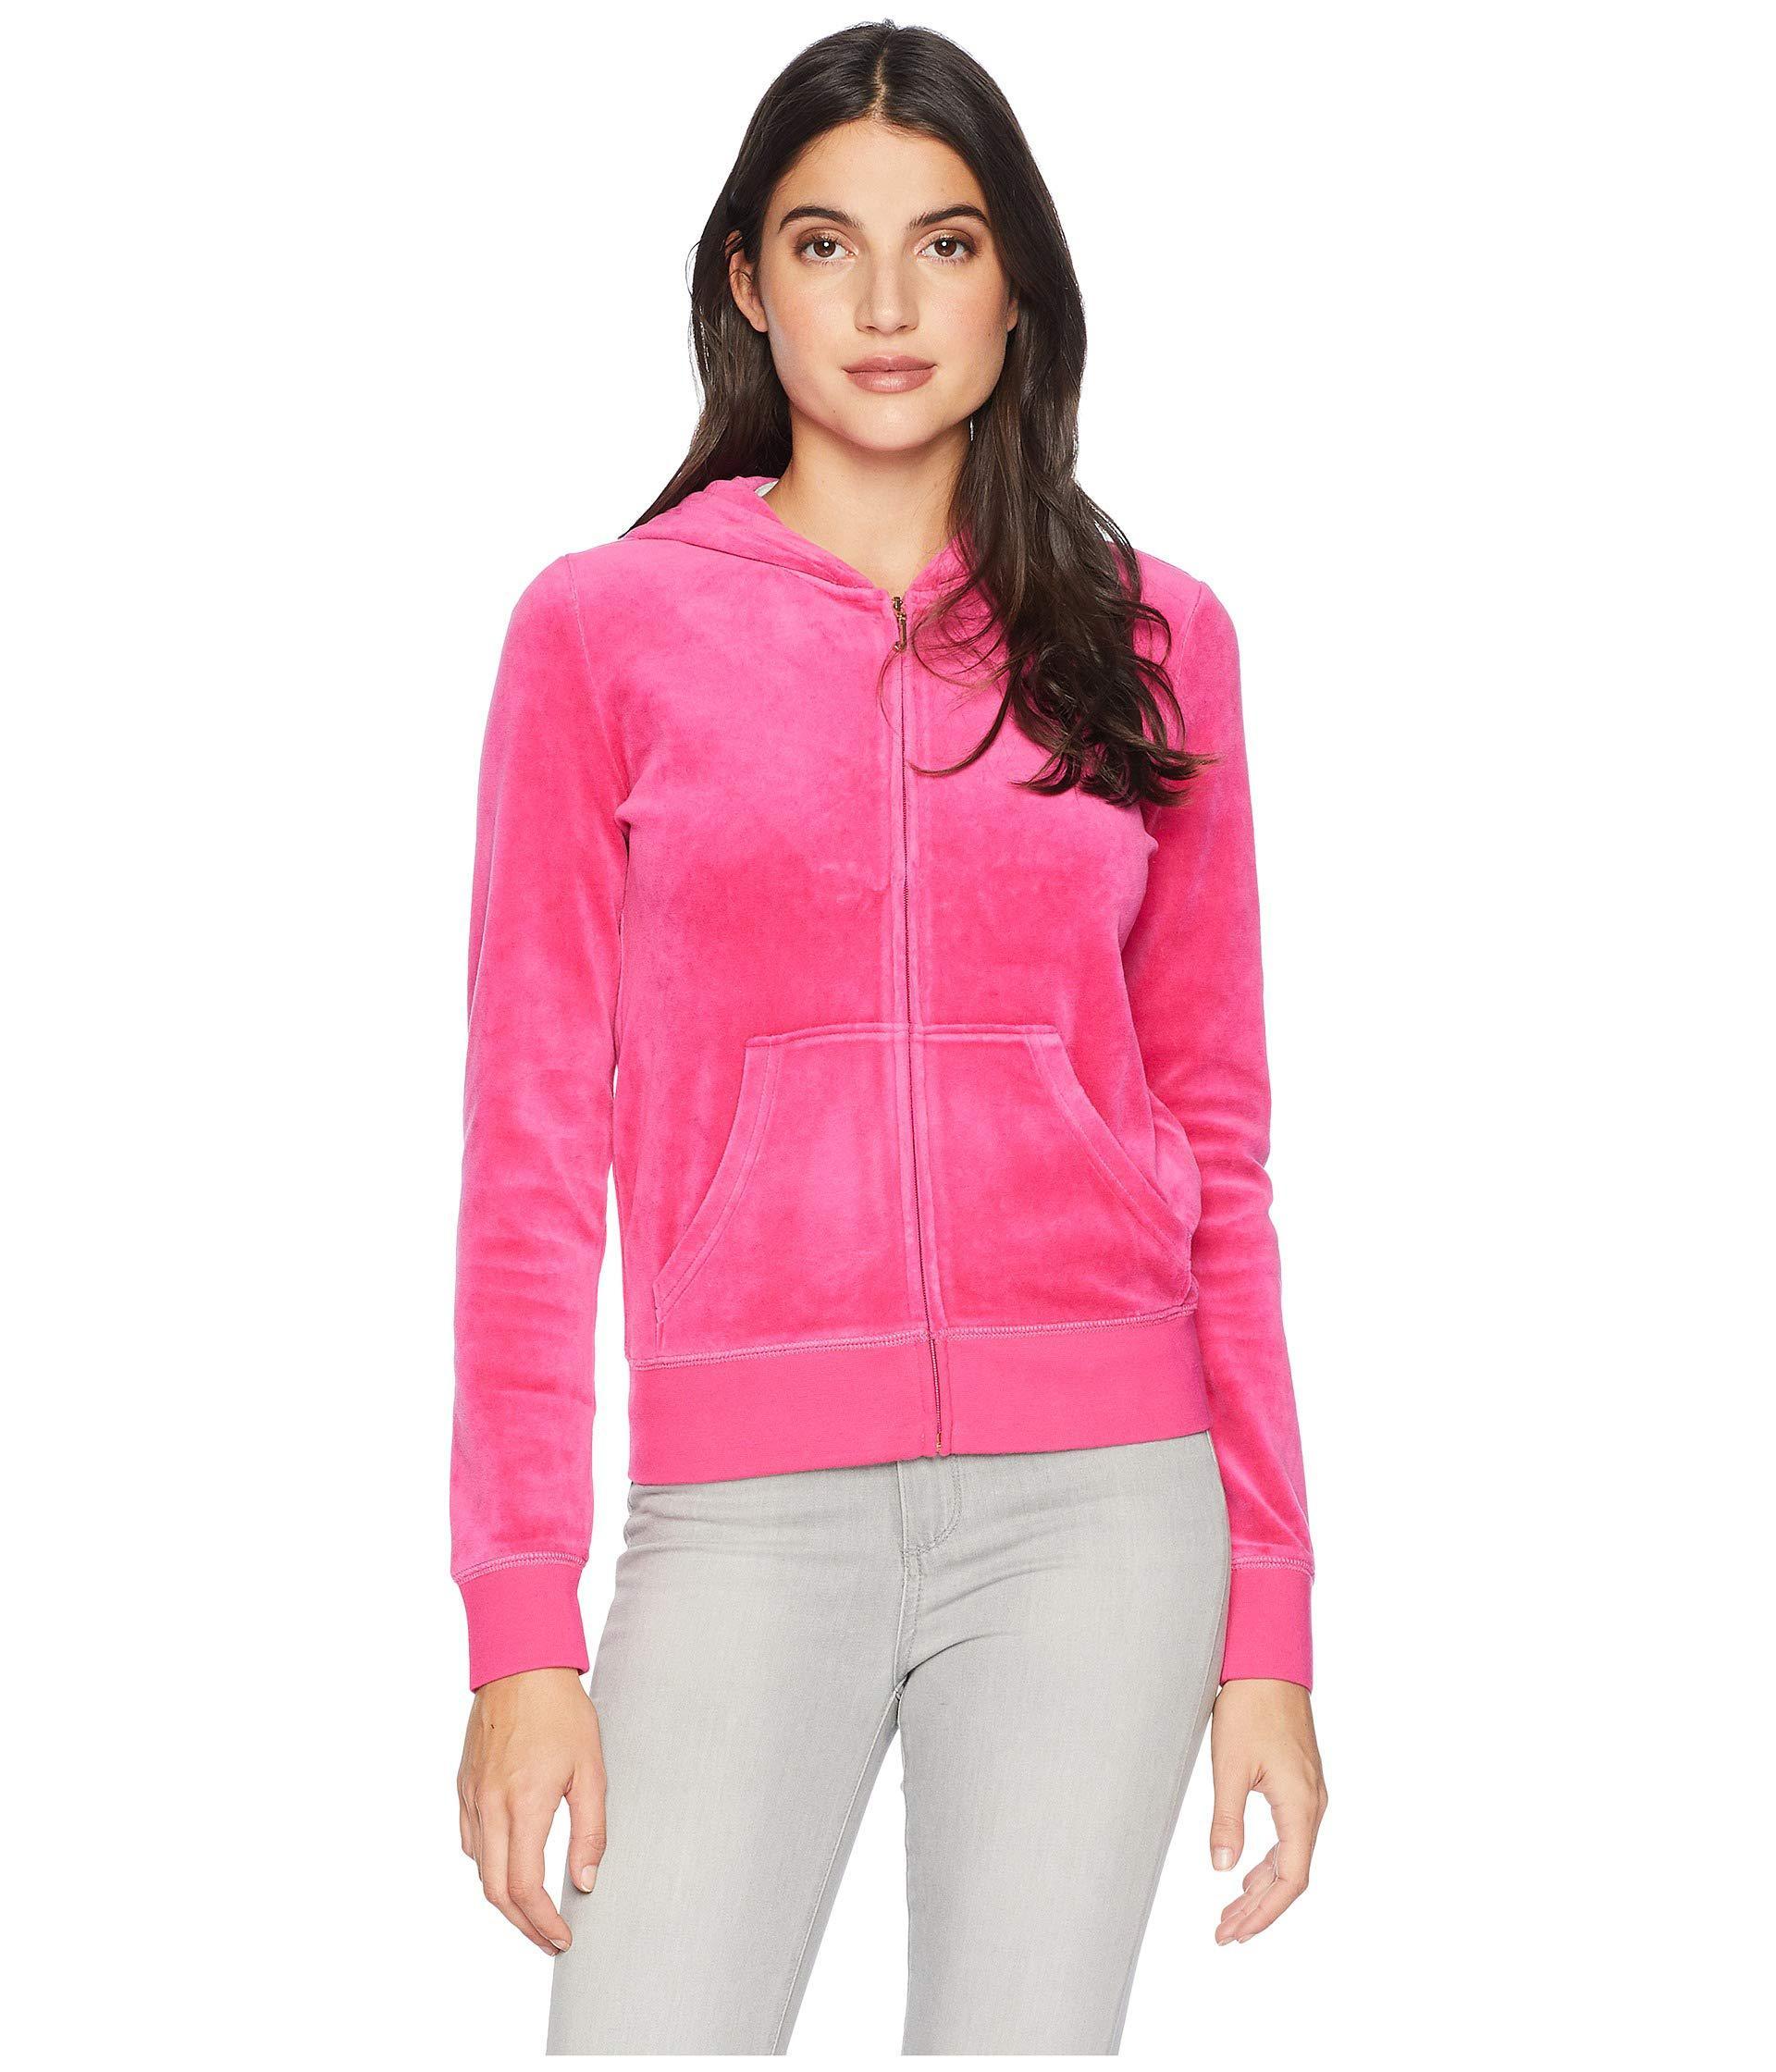 ff8391d3 Juicy Couture Track Velour Collegiate Juicy Robertson Jacket in Pink ...